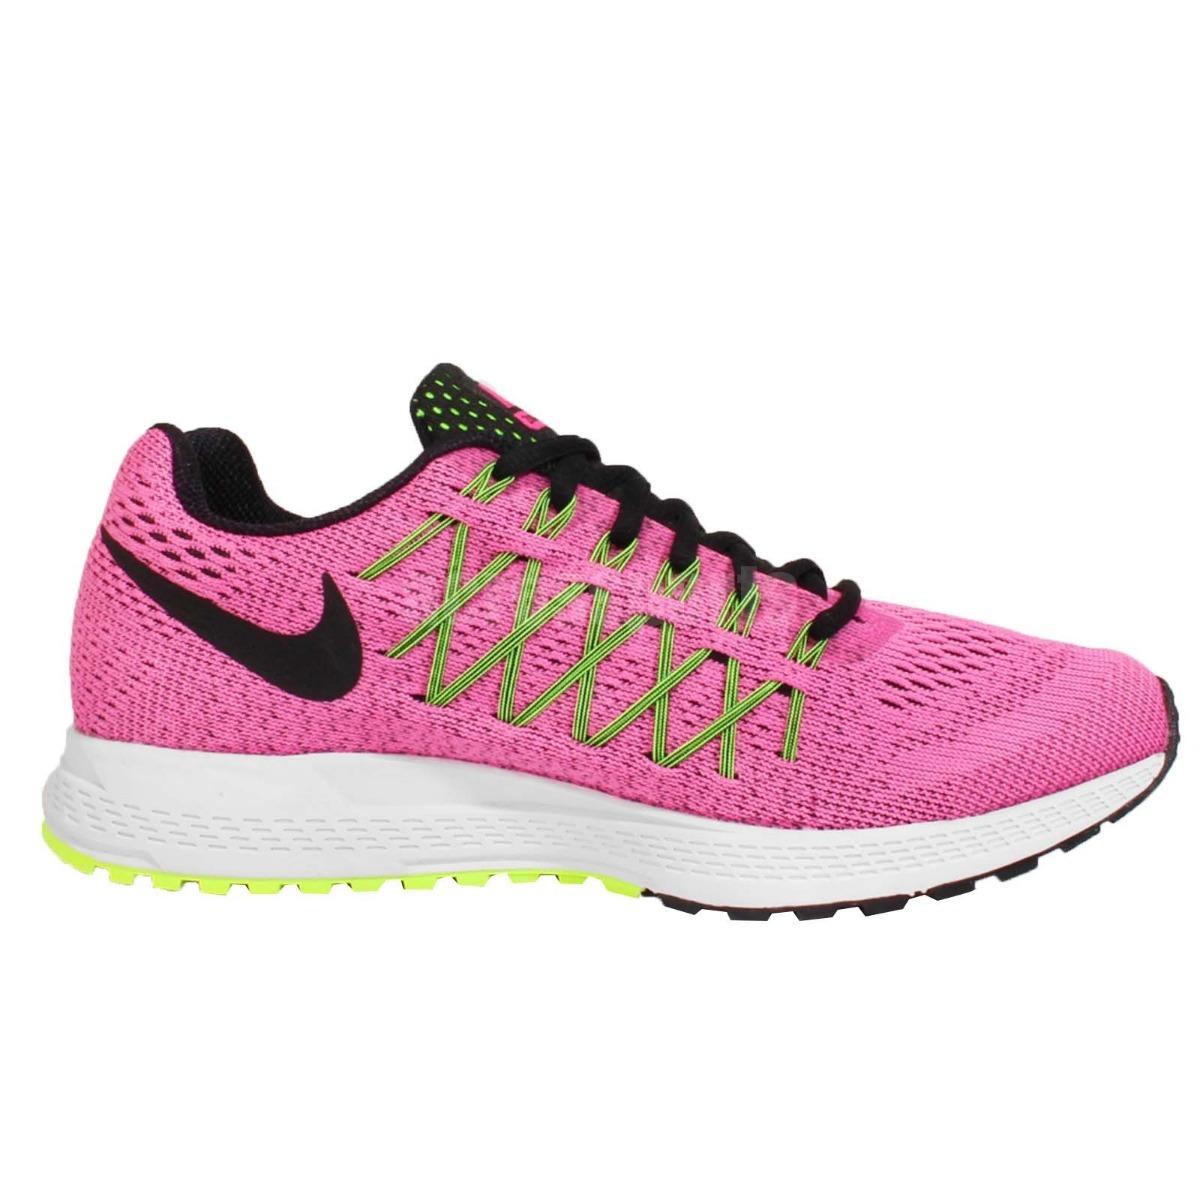 1553c9c9a5bf1 Zapatillas Nike Air Zoom Pegasus 32 Running Mujer -   3.199